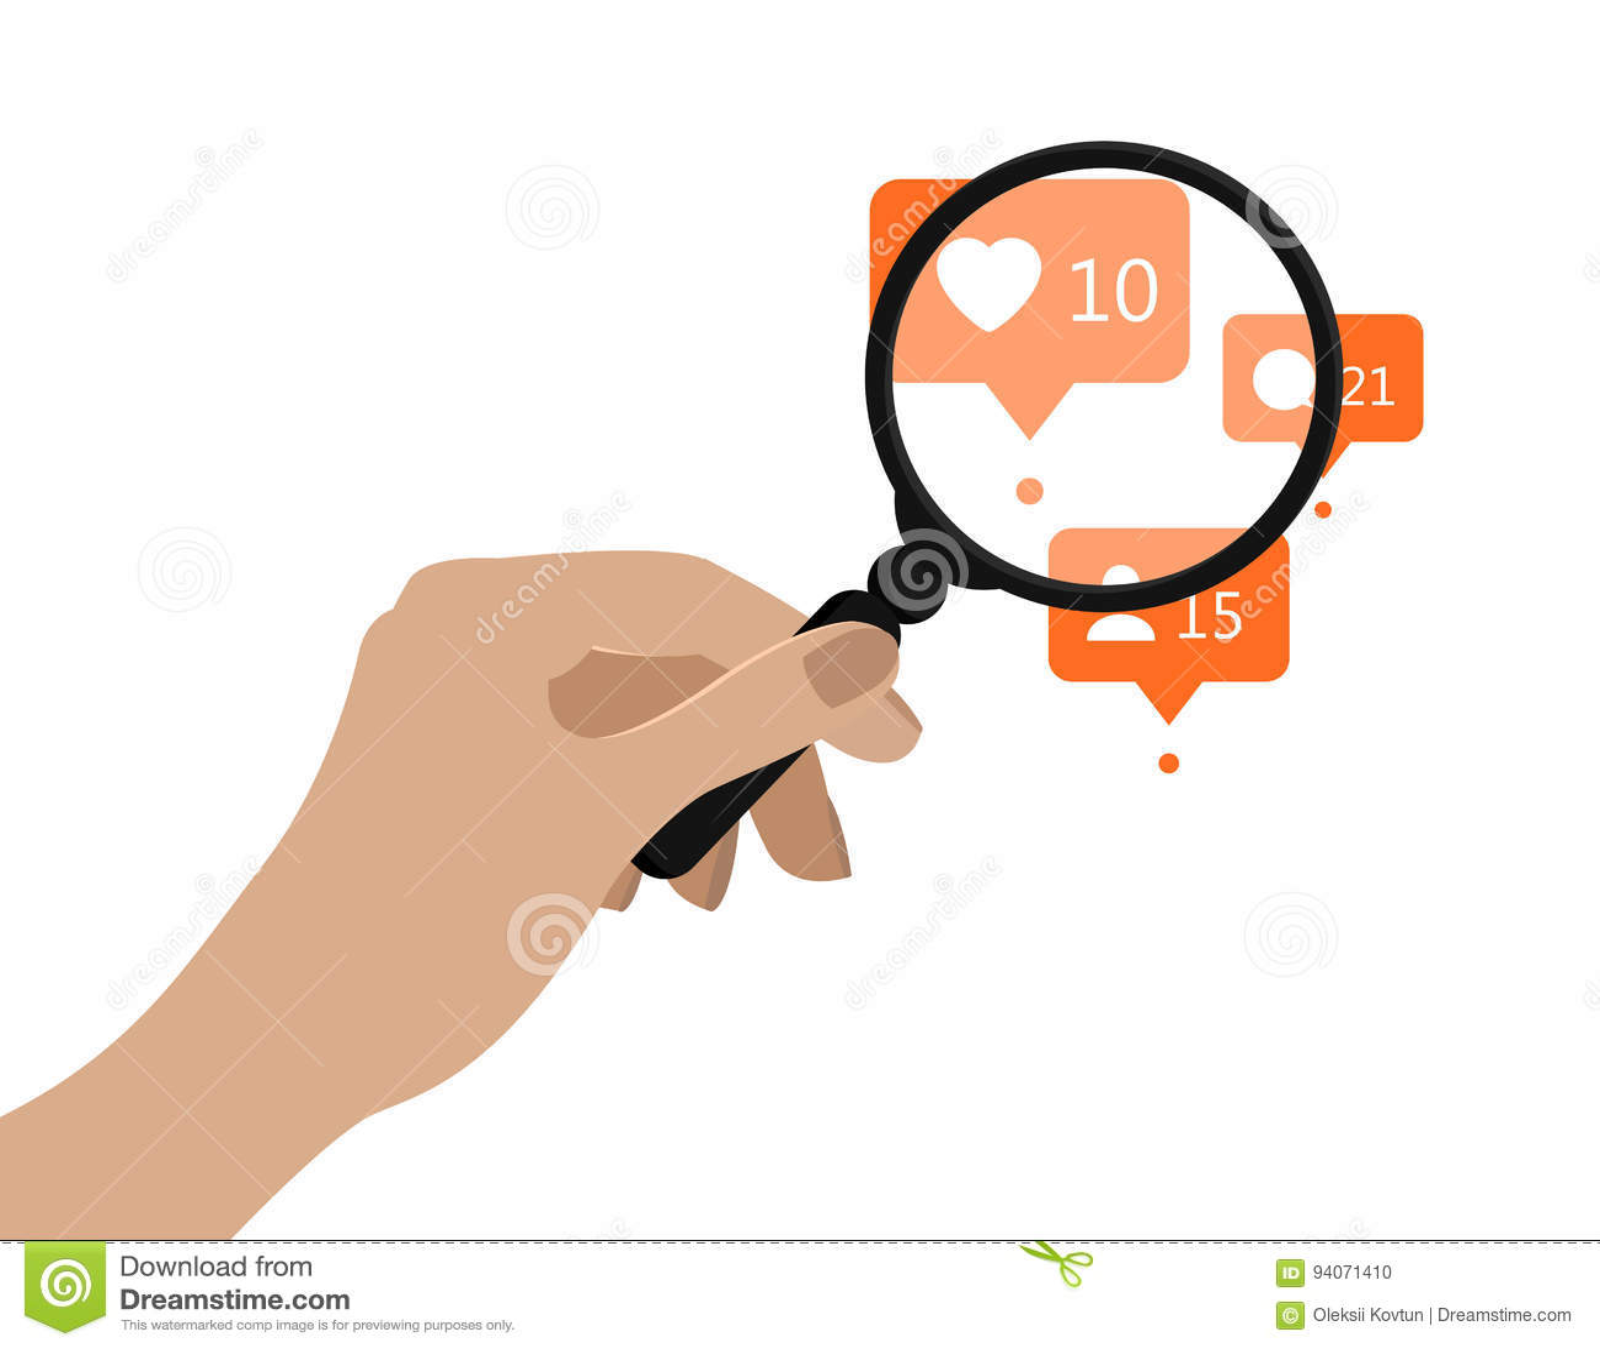 Hand holding magnifying glass. Vector illustration. Social media analytics concept. Orange notification icons under